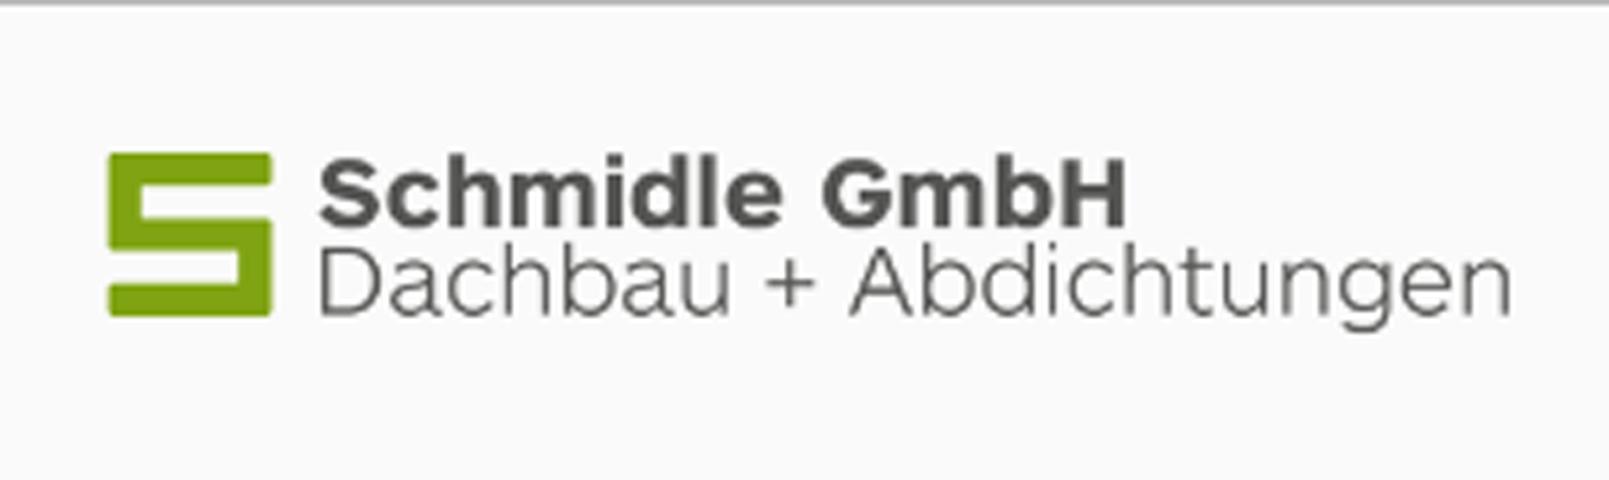 Schmidle GmbH Ulm